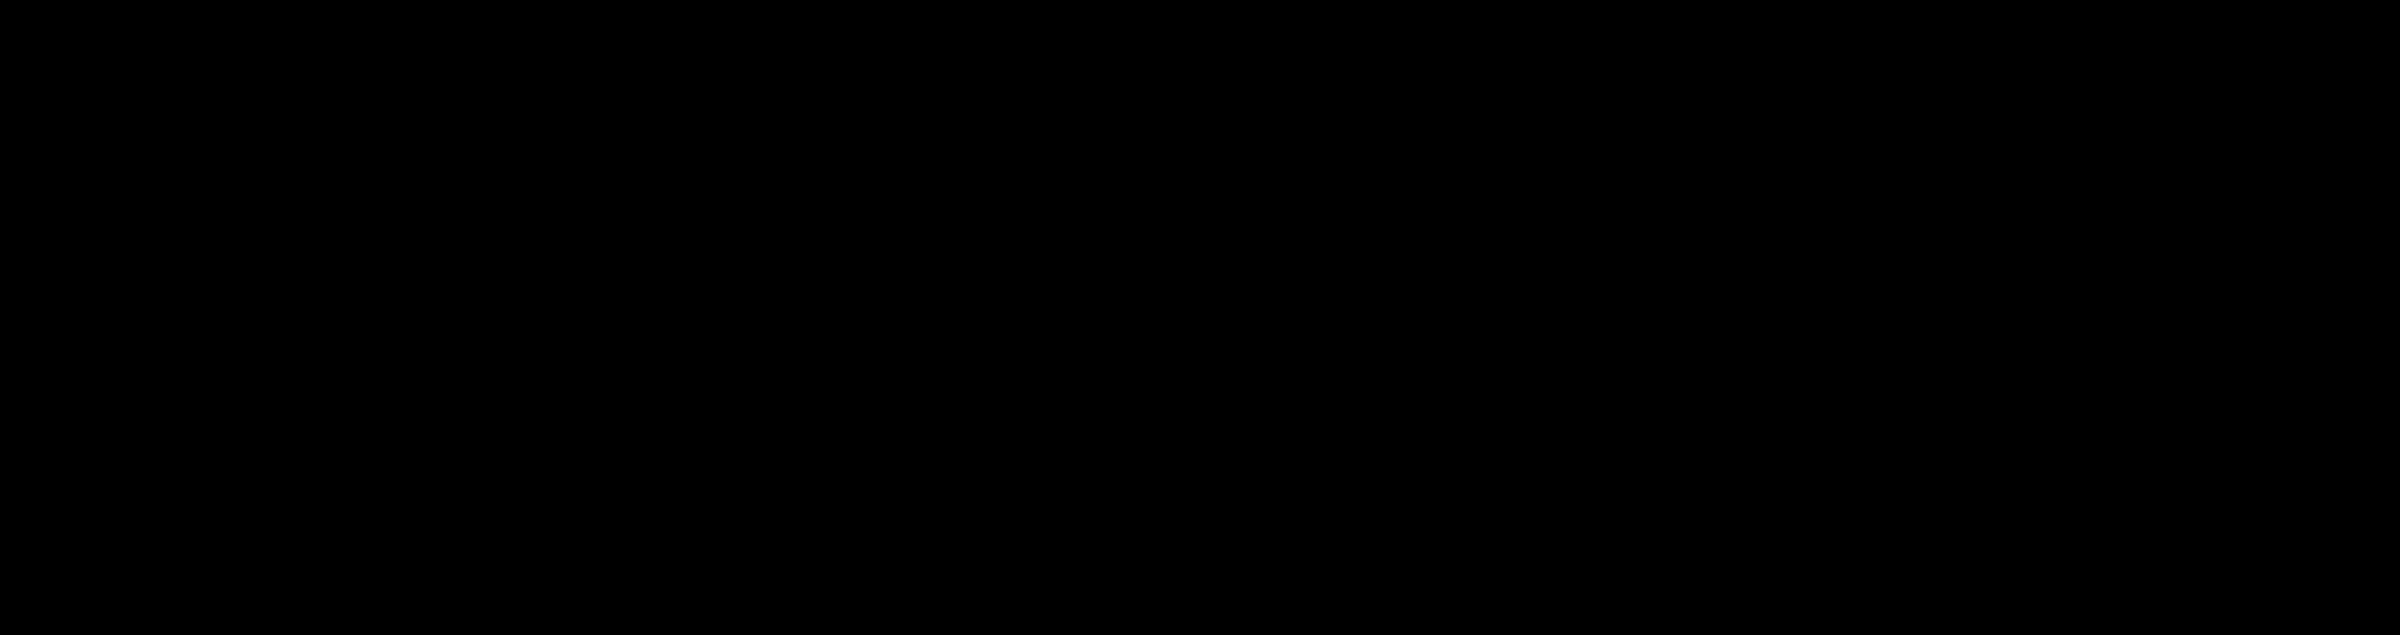 Bobcat Logo PNG Transparent & SVG Vector - Freebie Supply